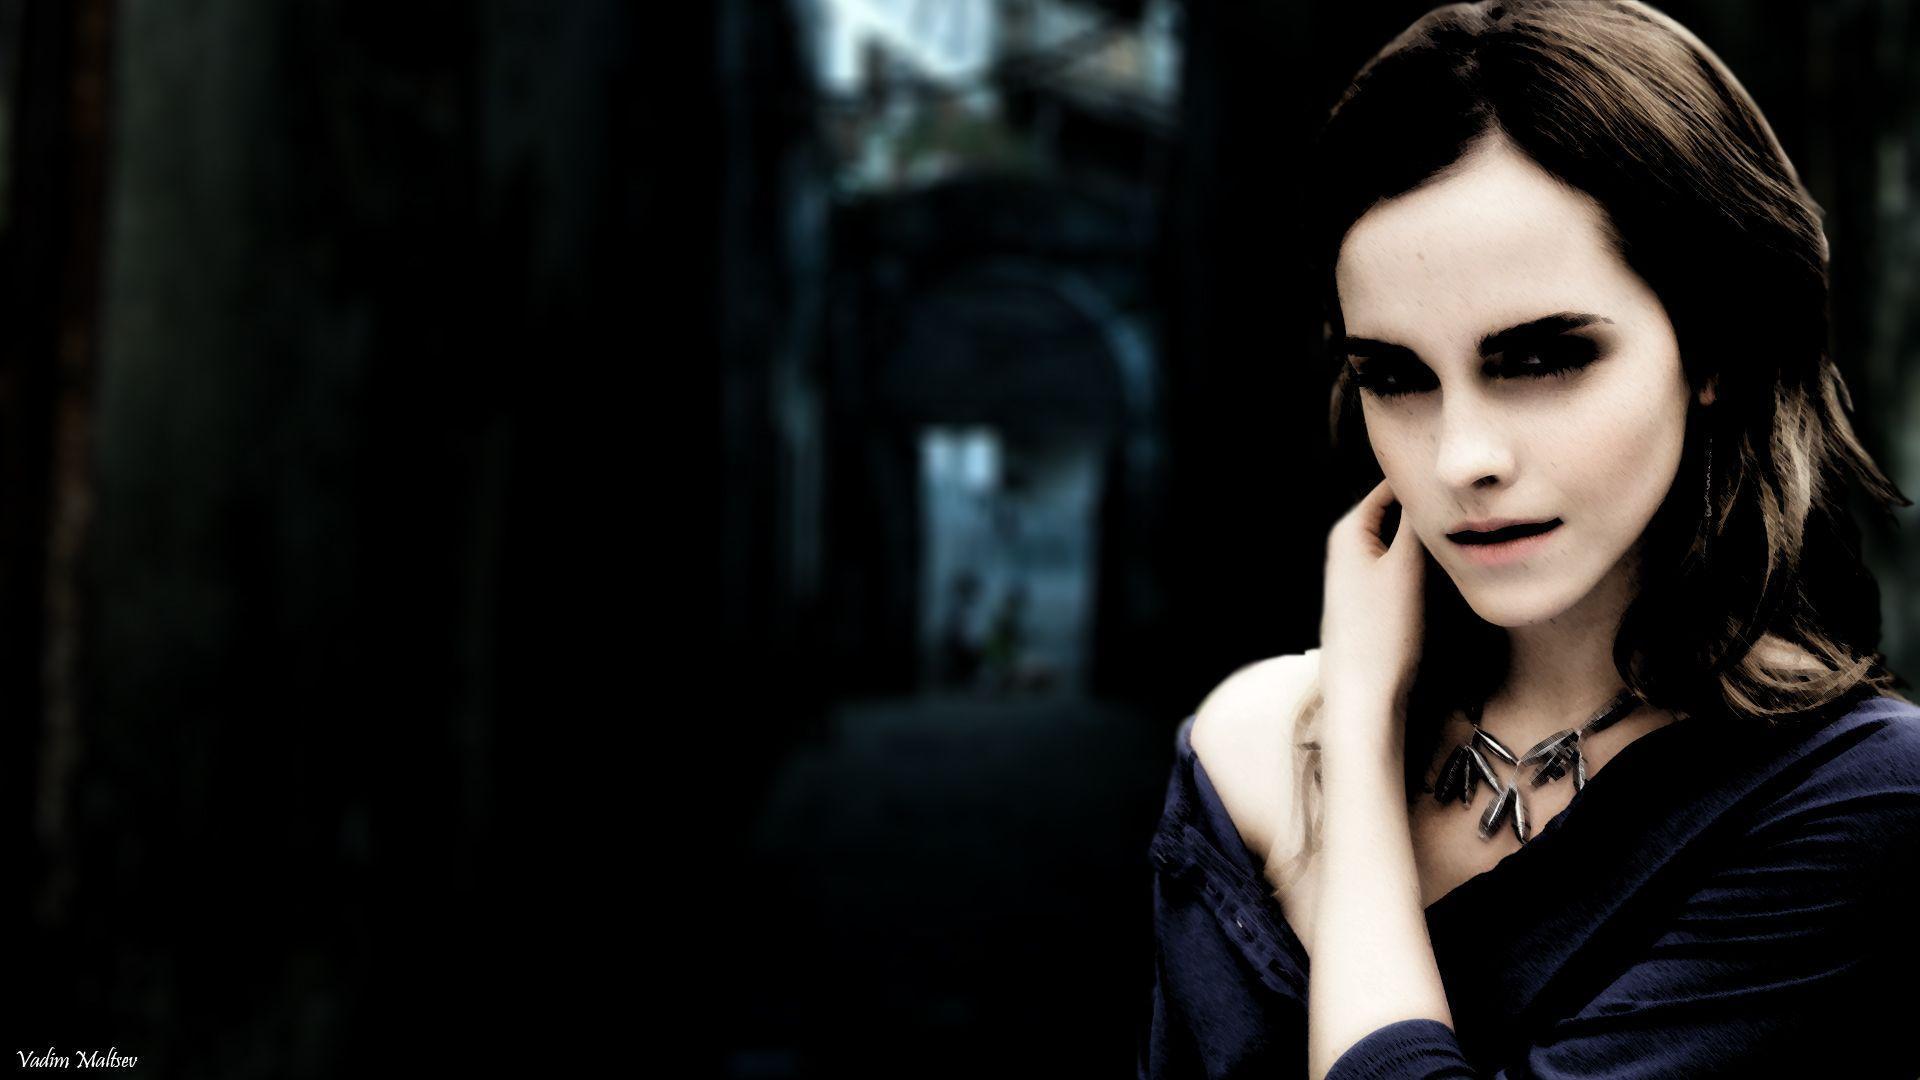 Emma Watson HD Wallpapers 1080p - WallpaperSafari